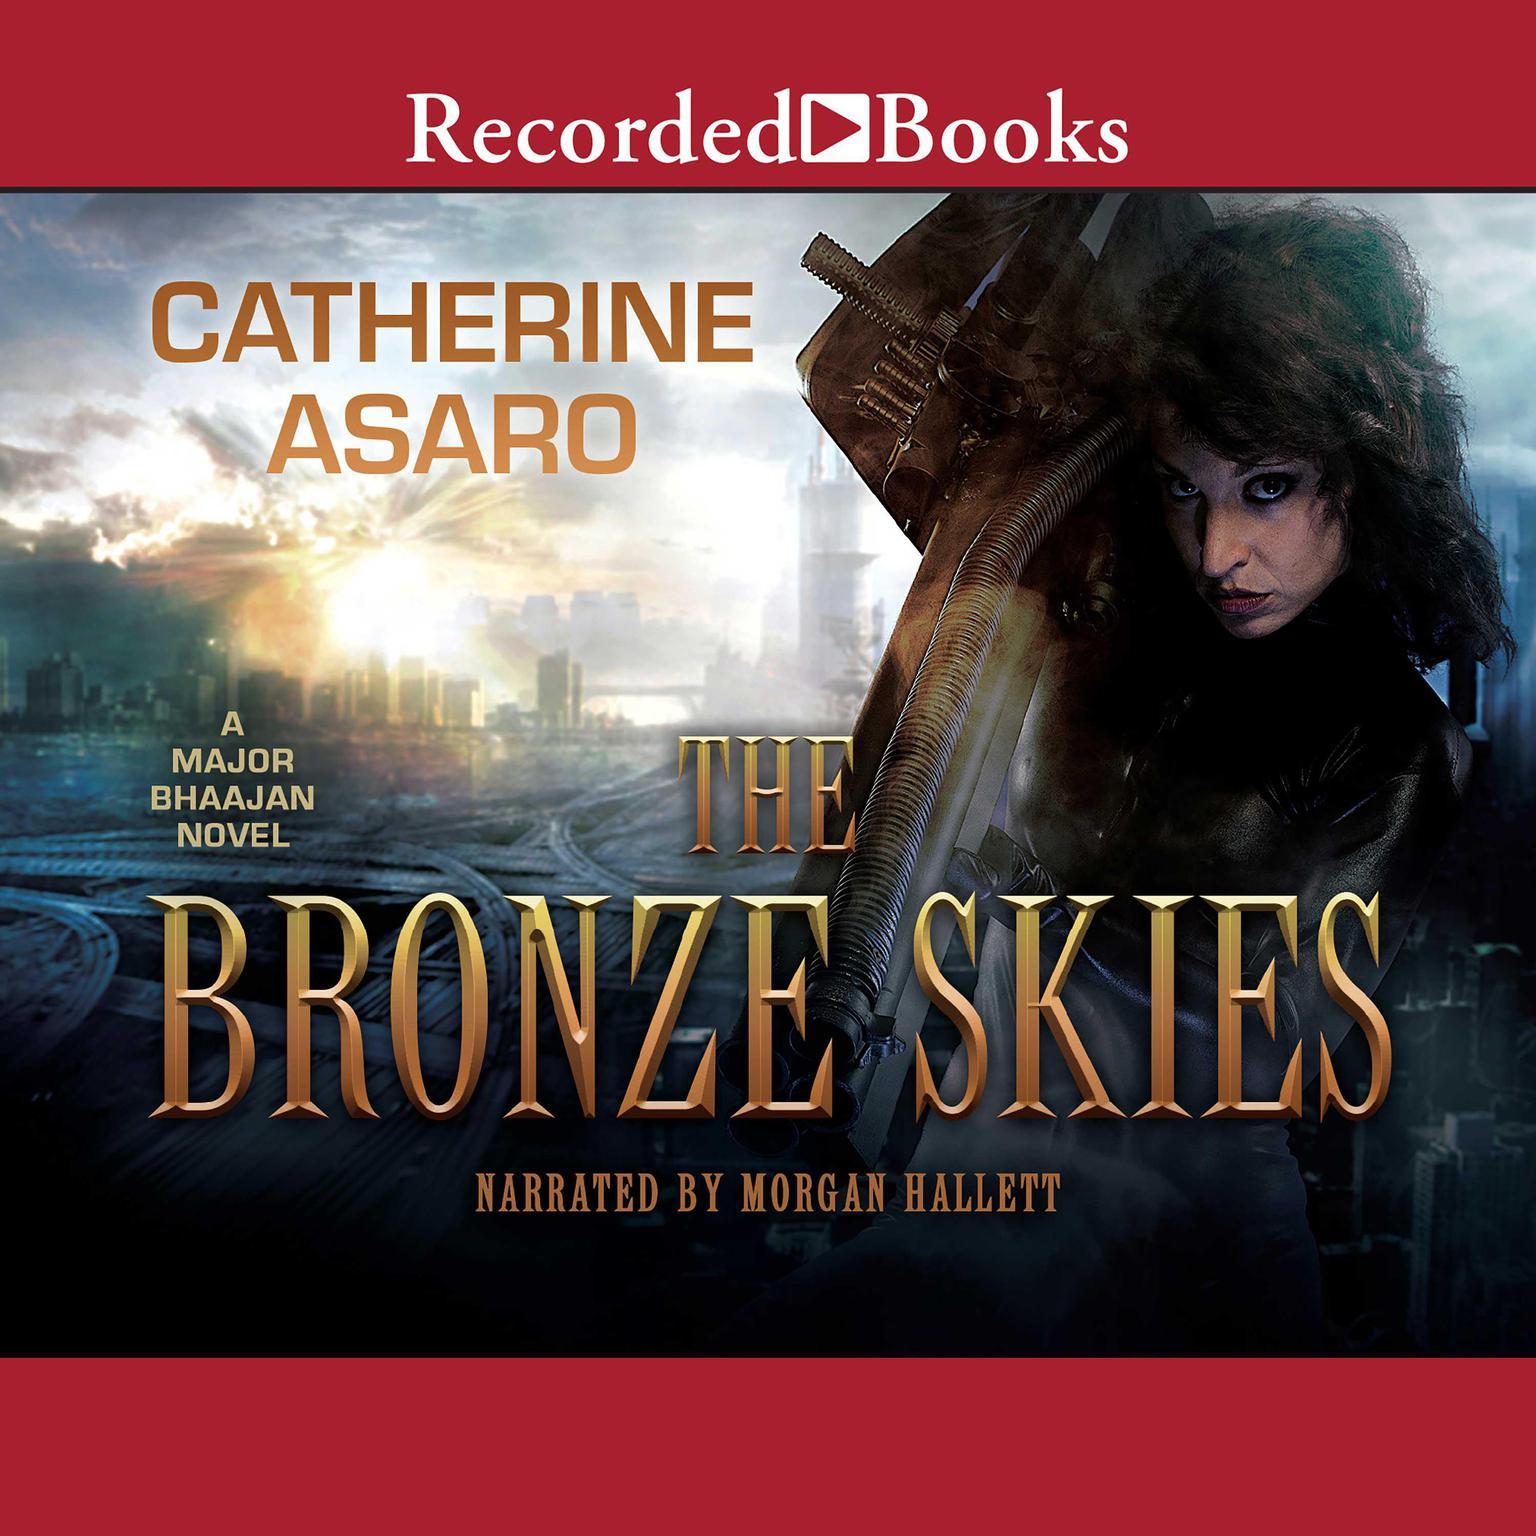 Bronze Skies Audiobook, by Catherine Asaro